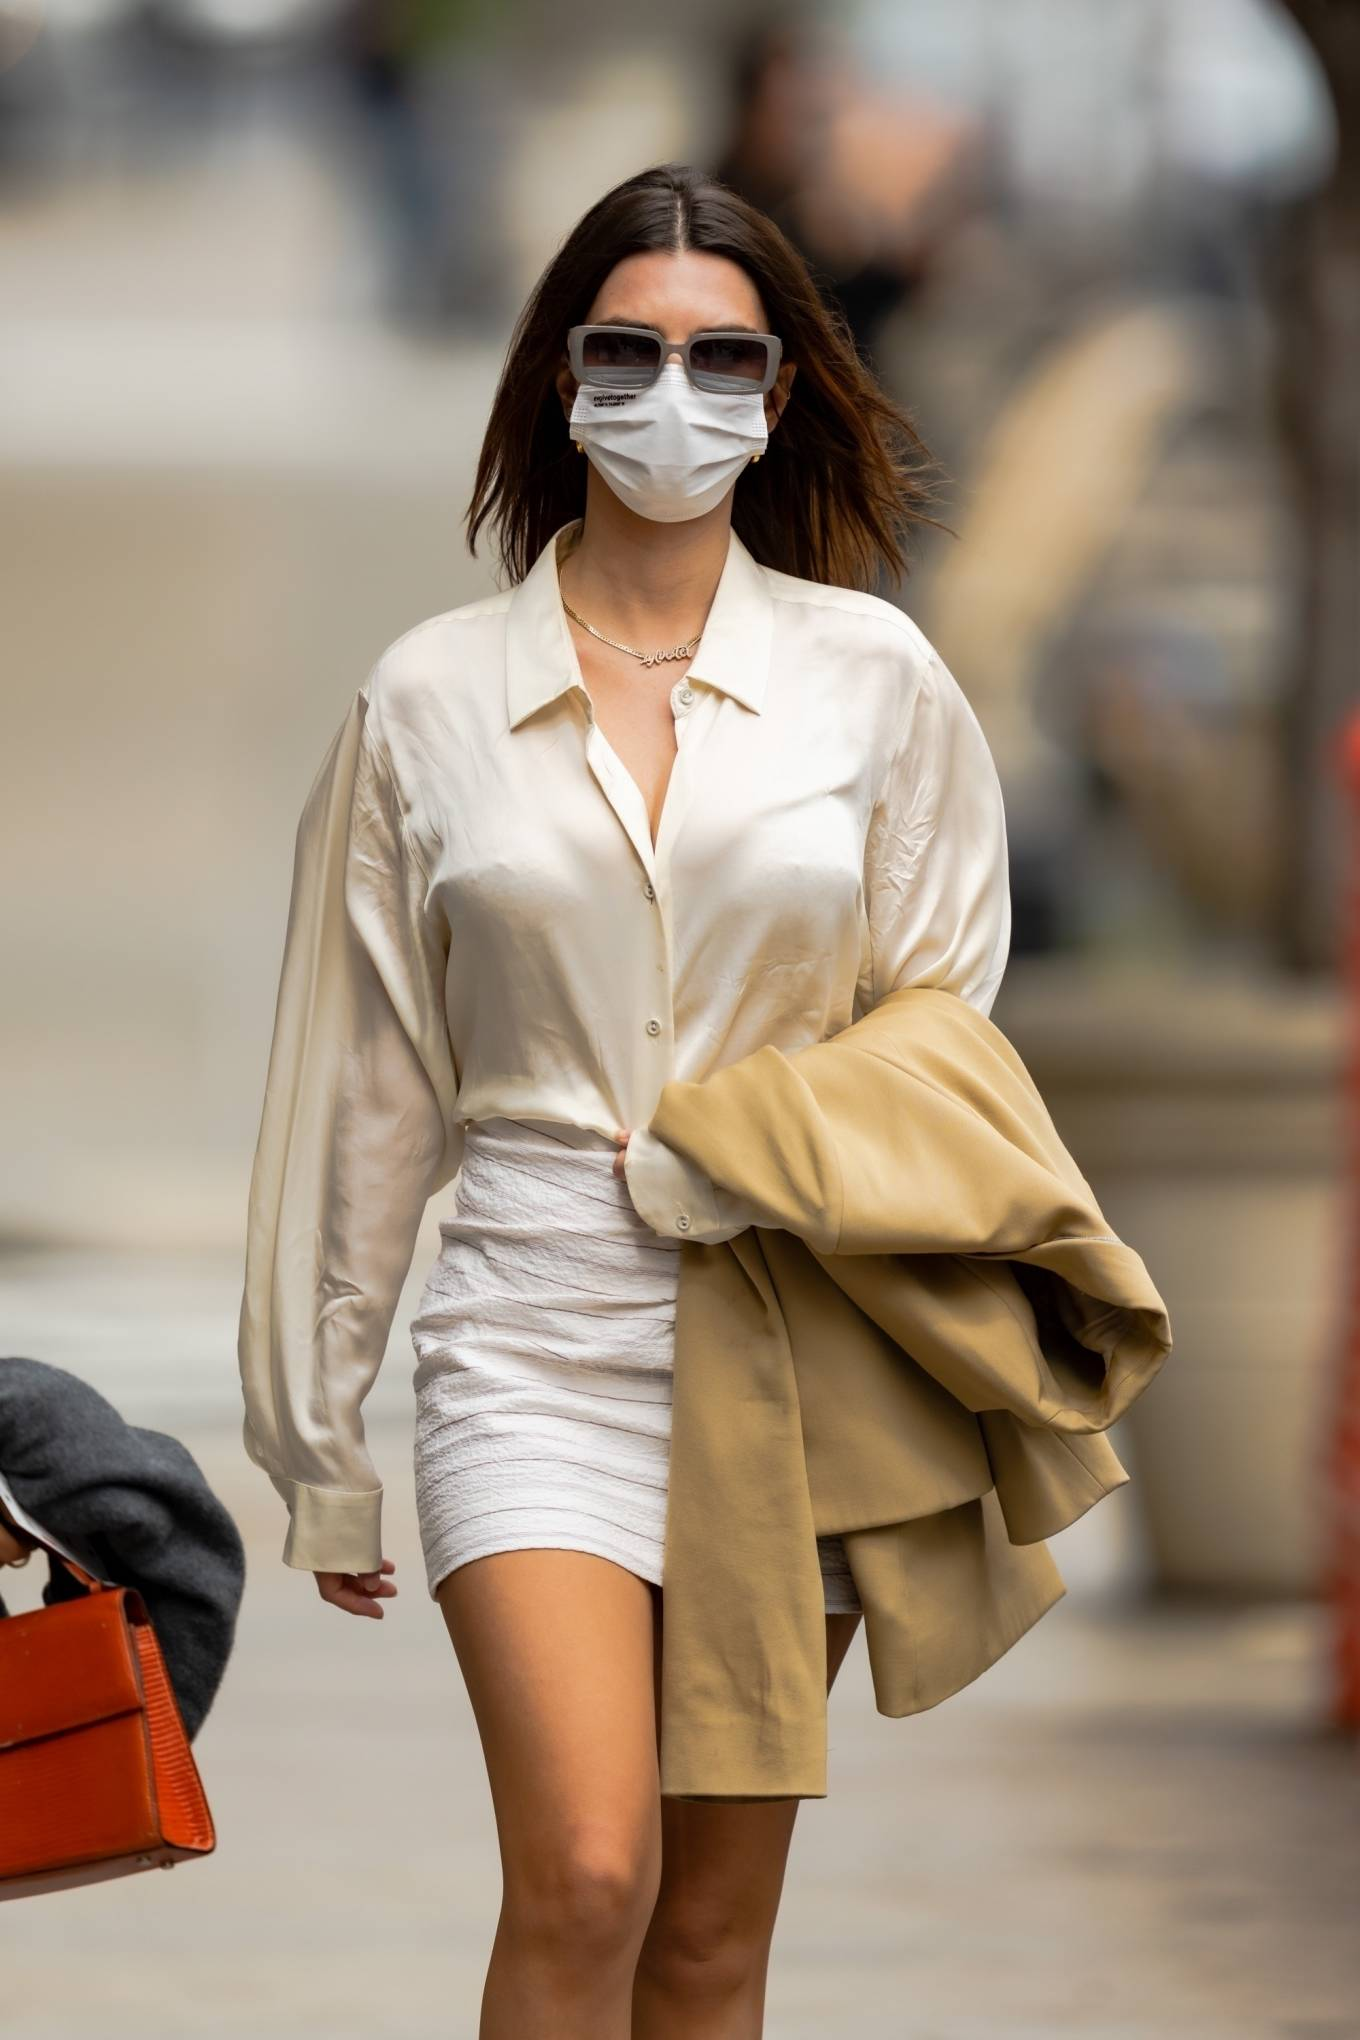 Emily Ratajkowski - In white mini skirt out for a walk in New York